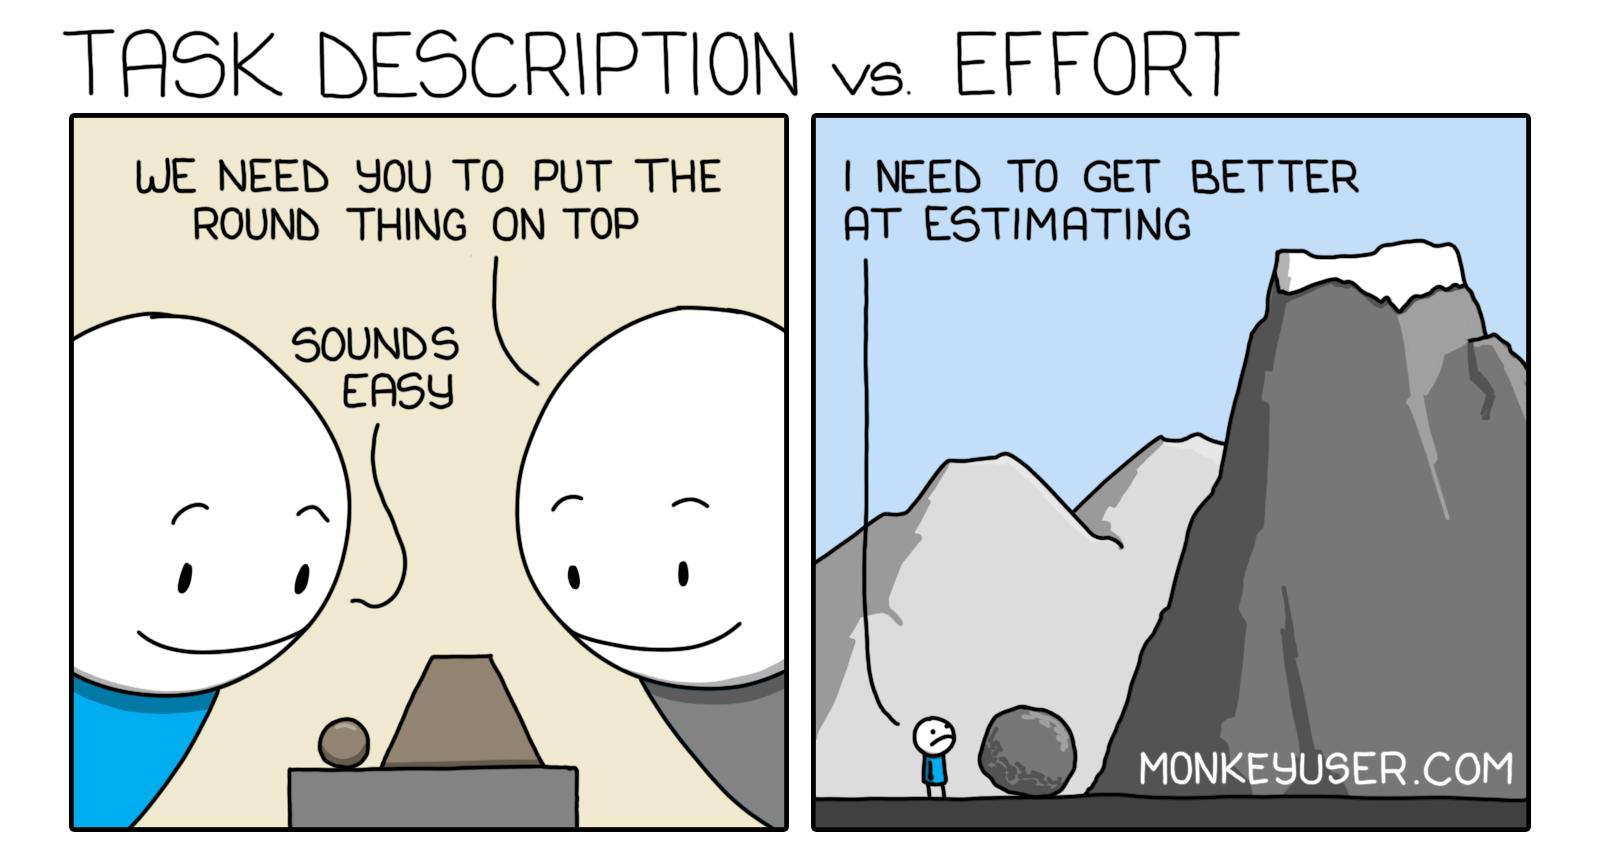 Task Description vs Effort